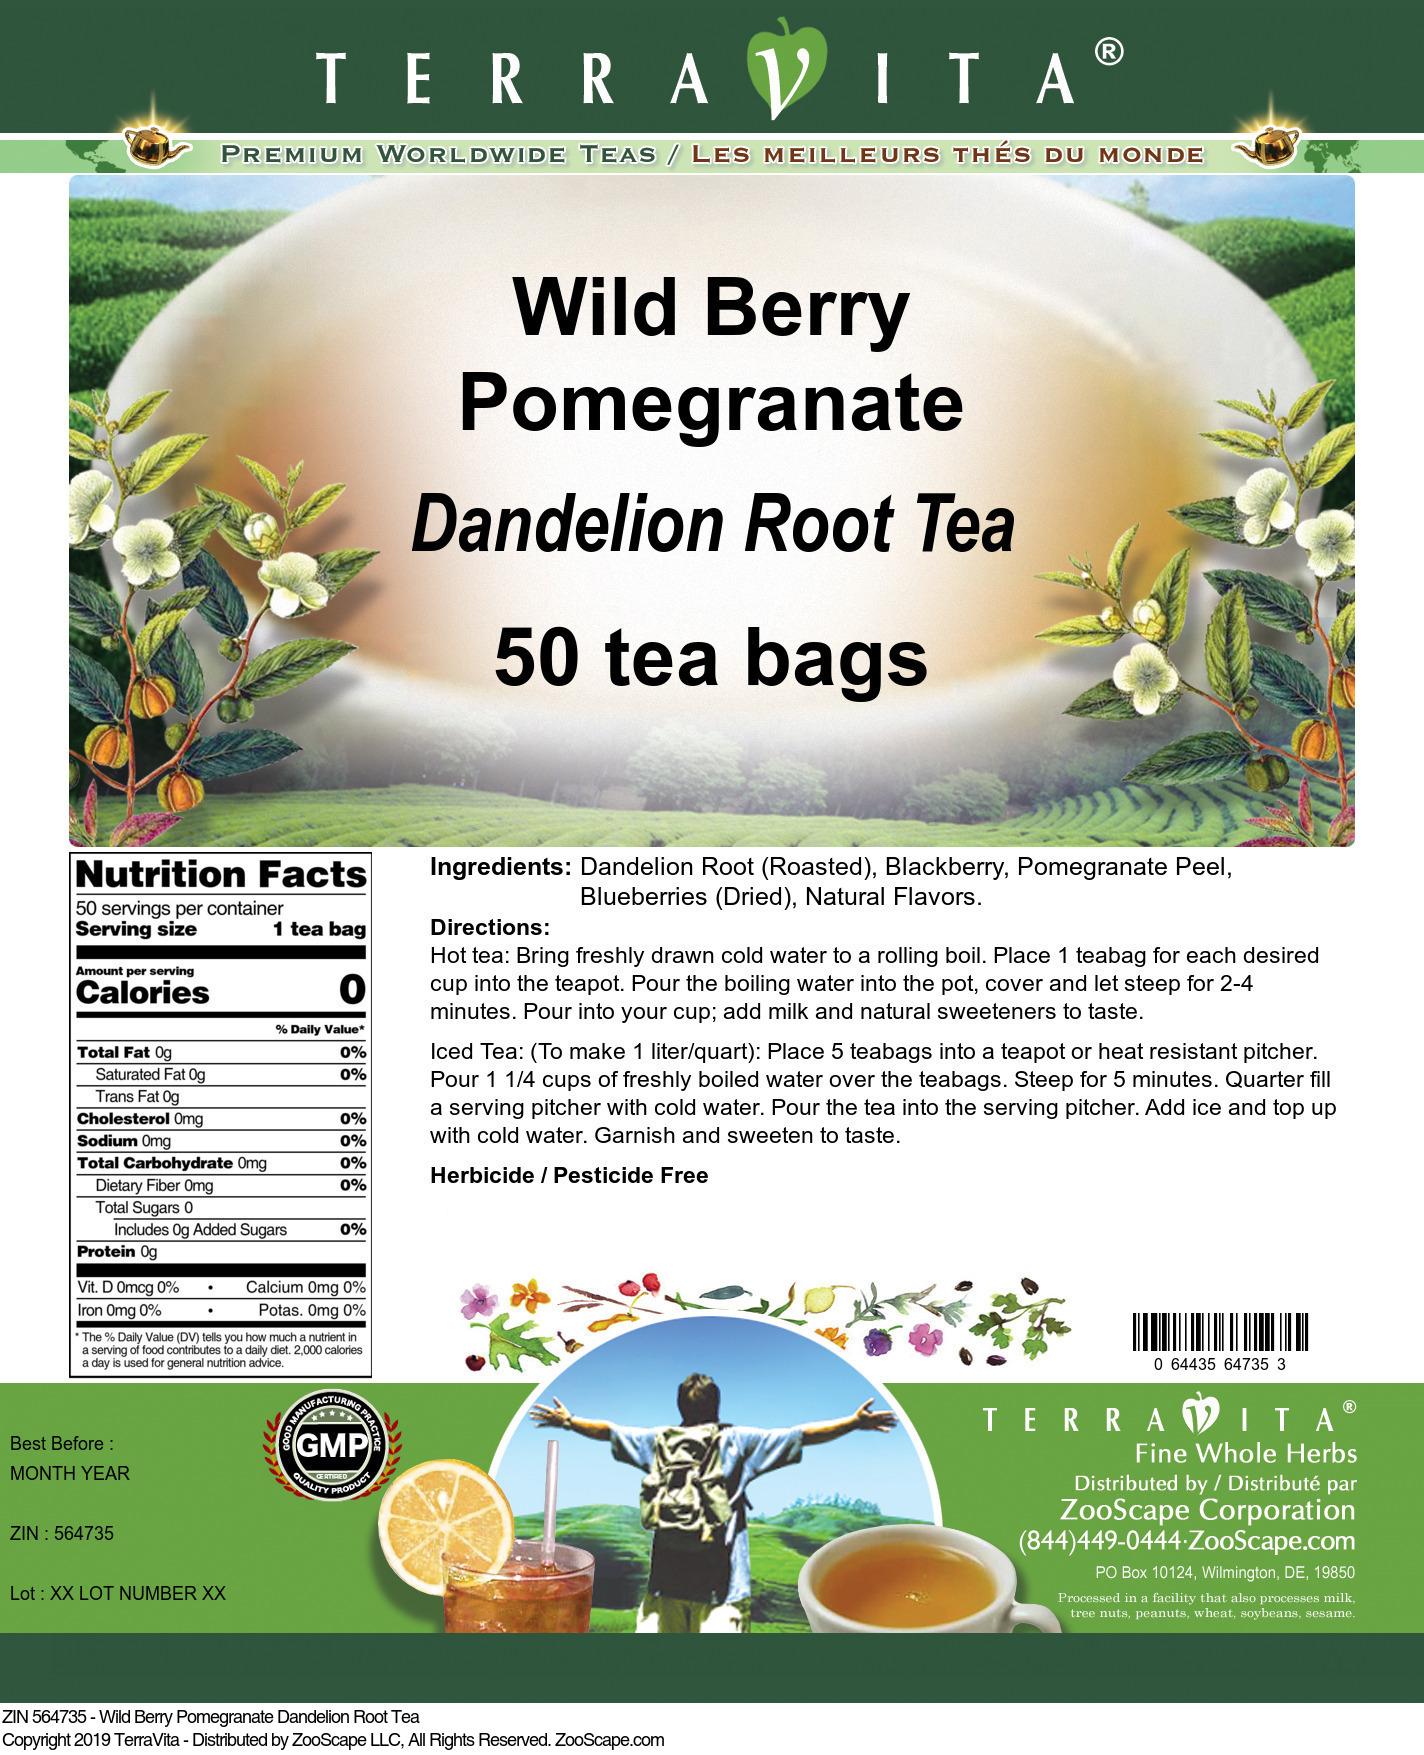 Wild Berry Pomegranate Dandelion Root Tea